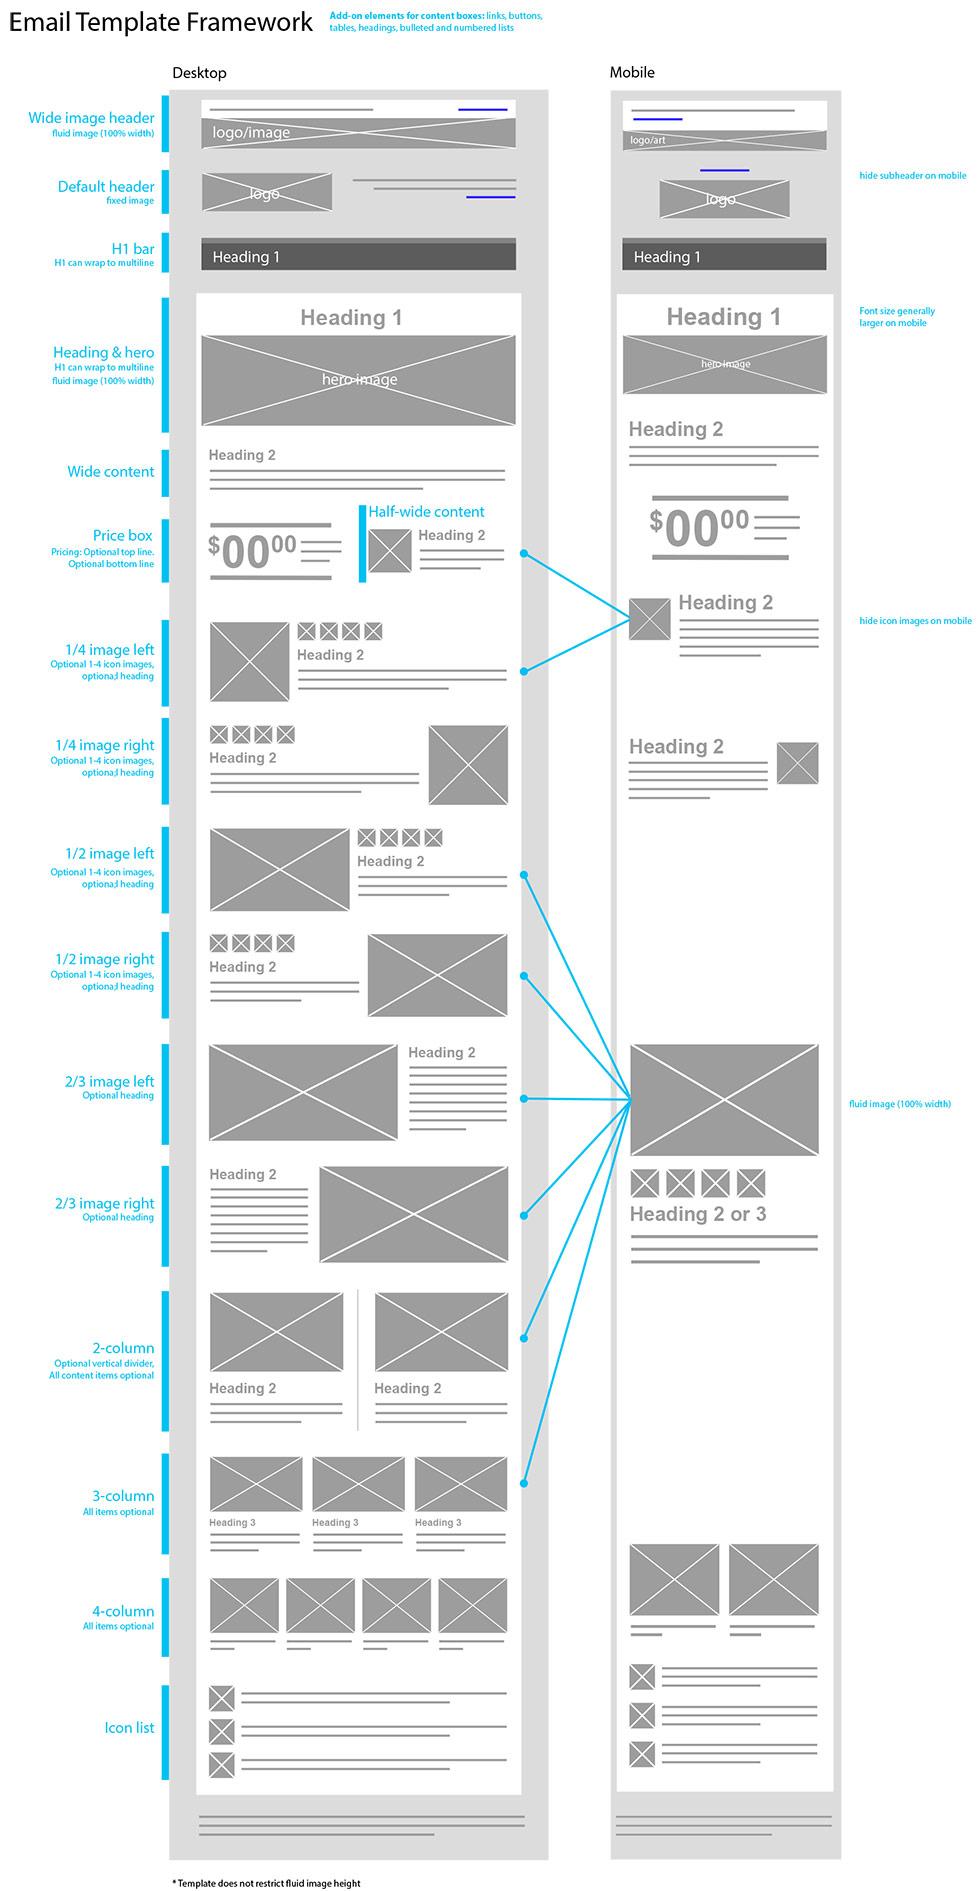 Marketing Email Framework | John M  Leary